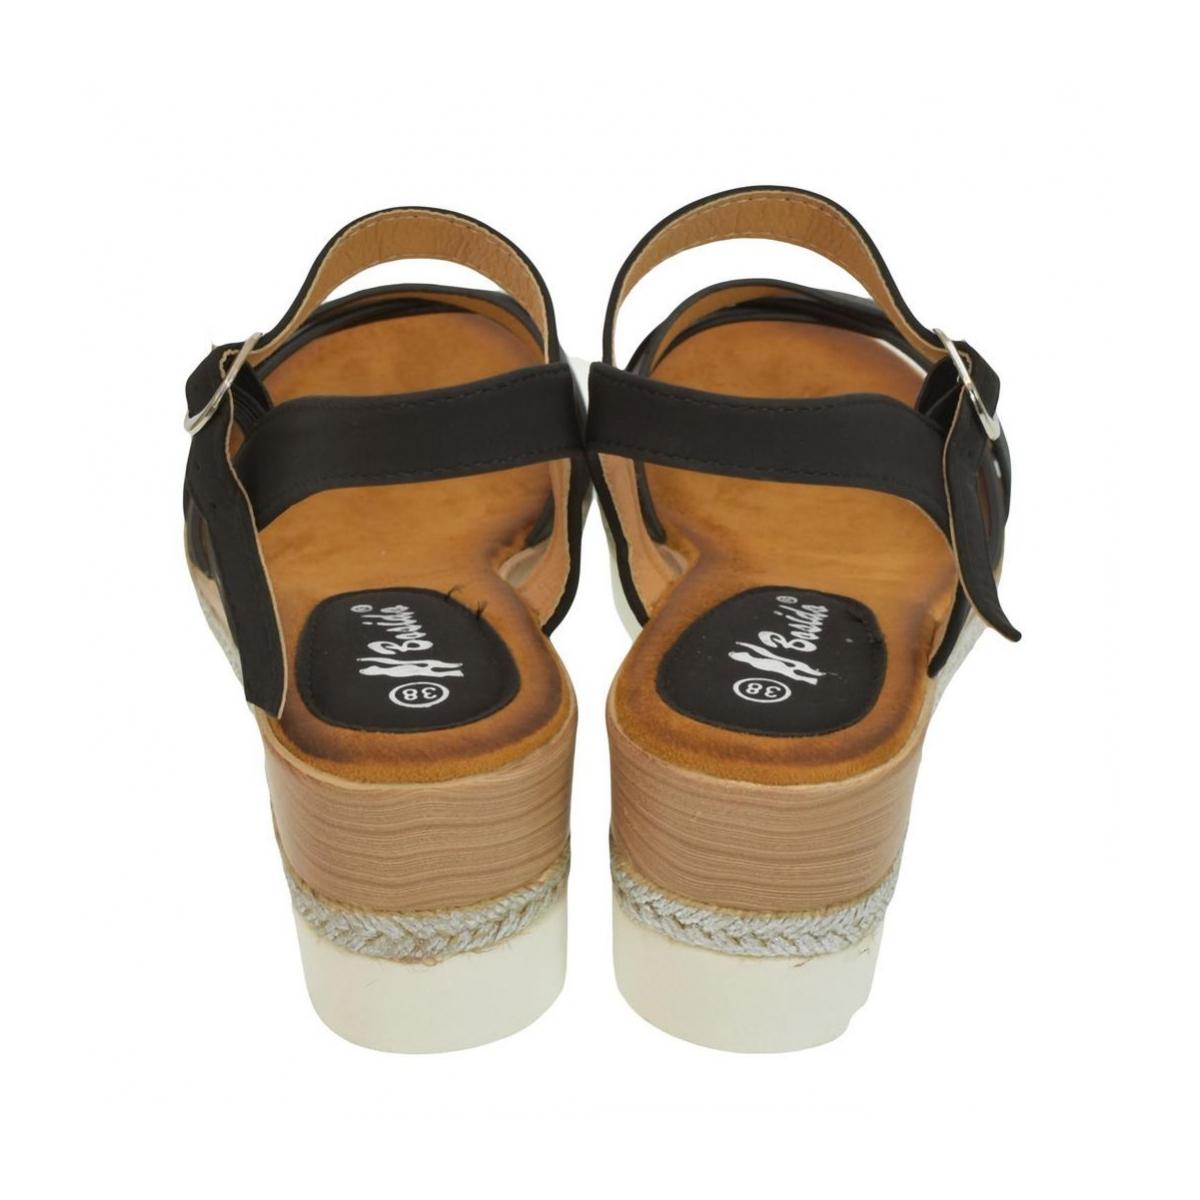 2c7e4df230f1 Dámske čierne sandále RILLA - 3